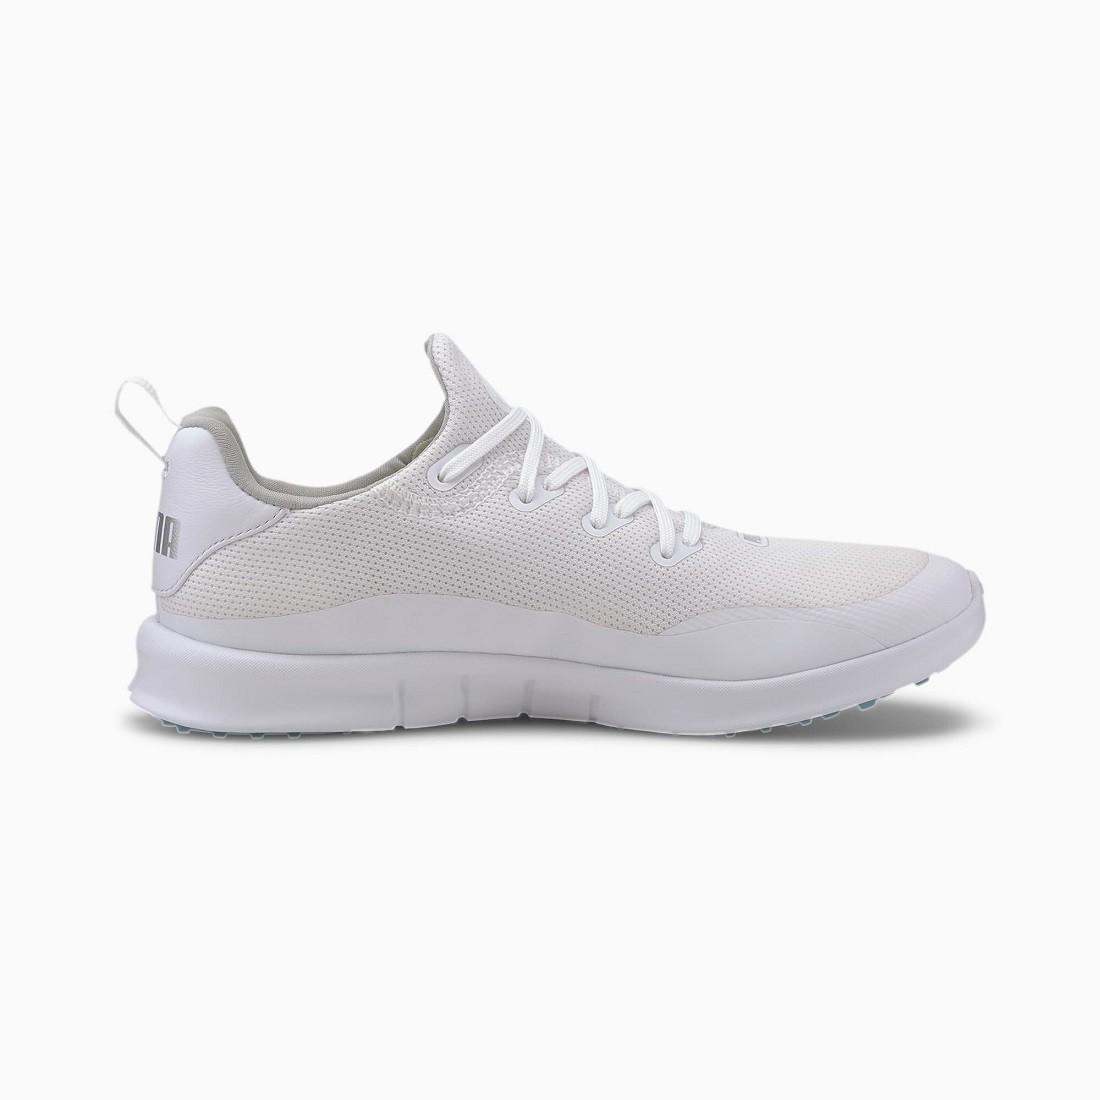 Puma chaussures Laguna sport blanc